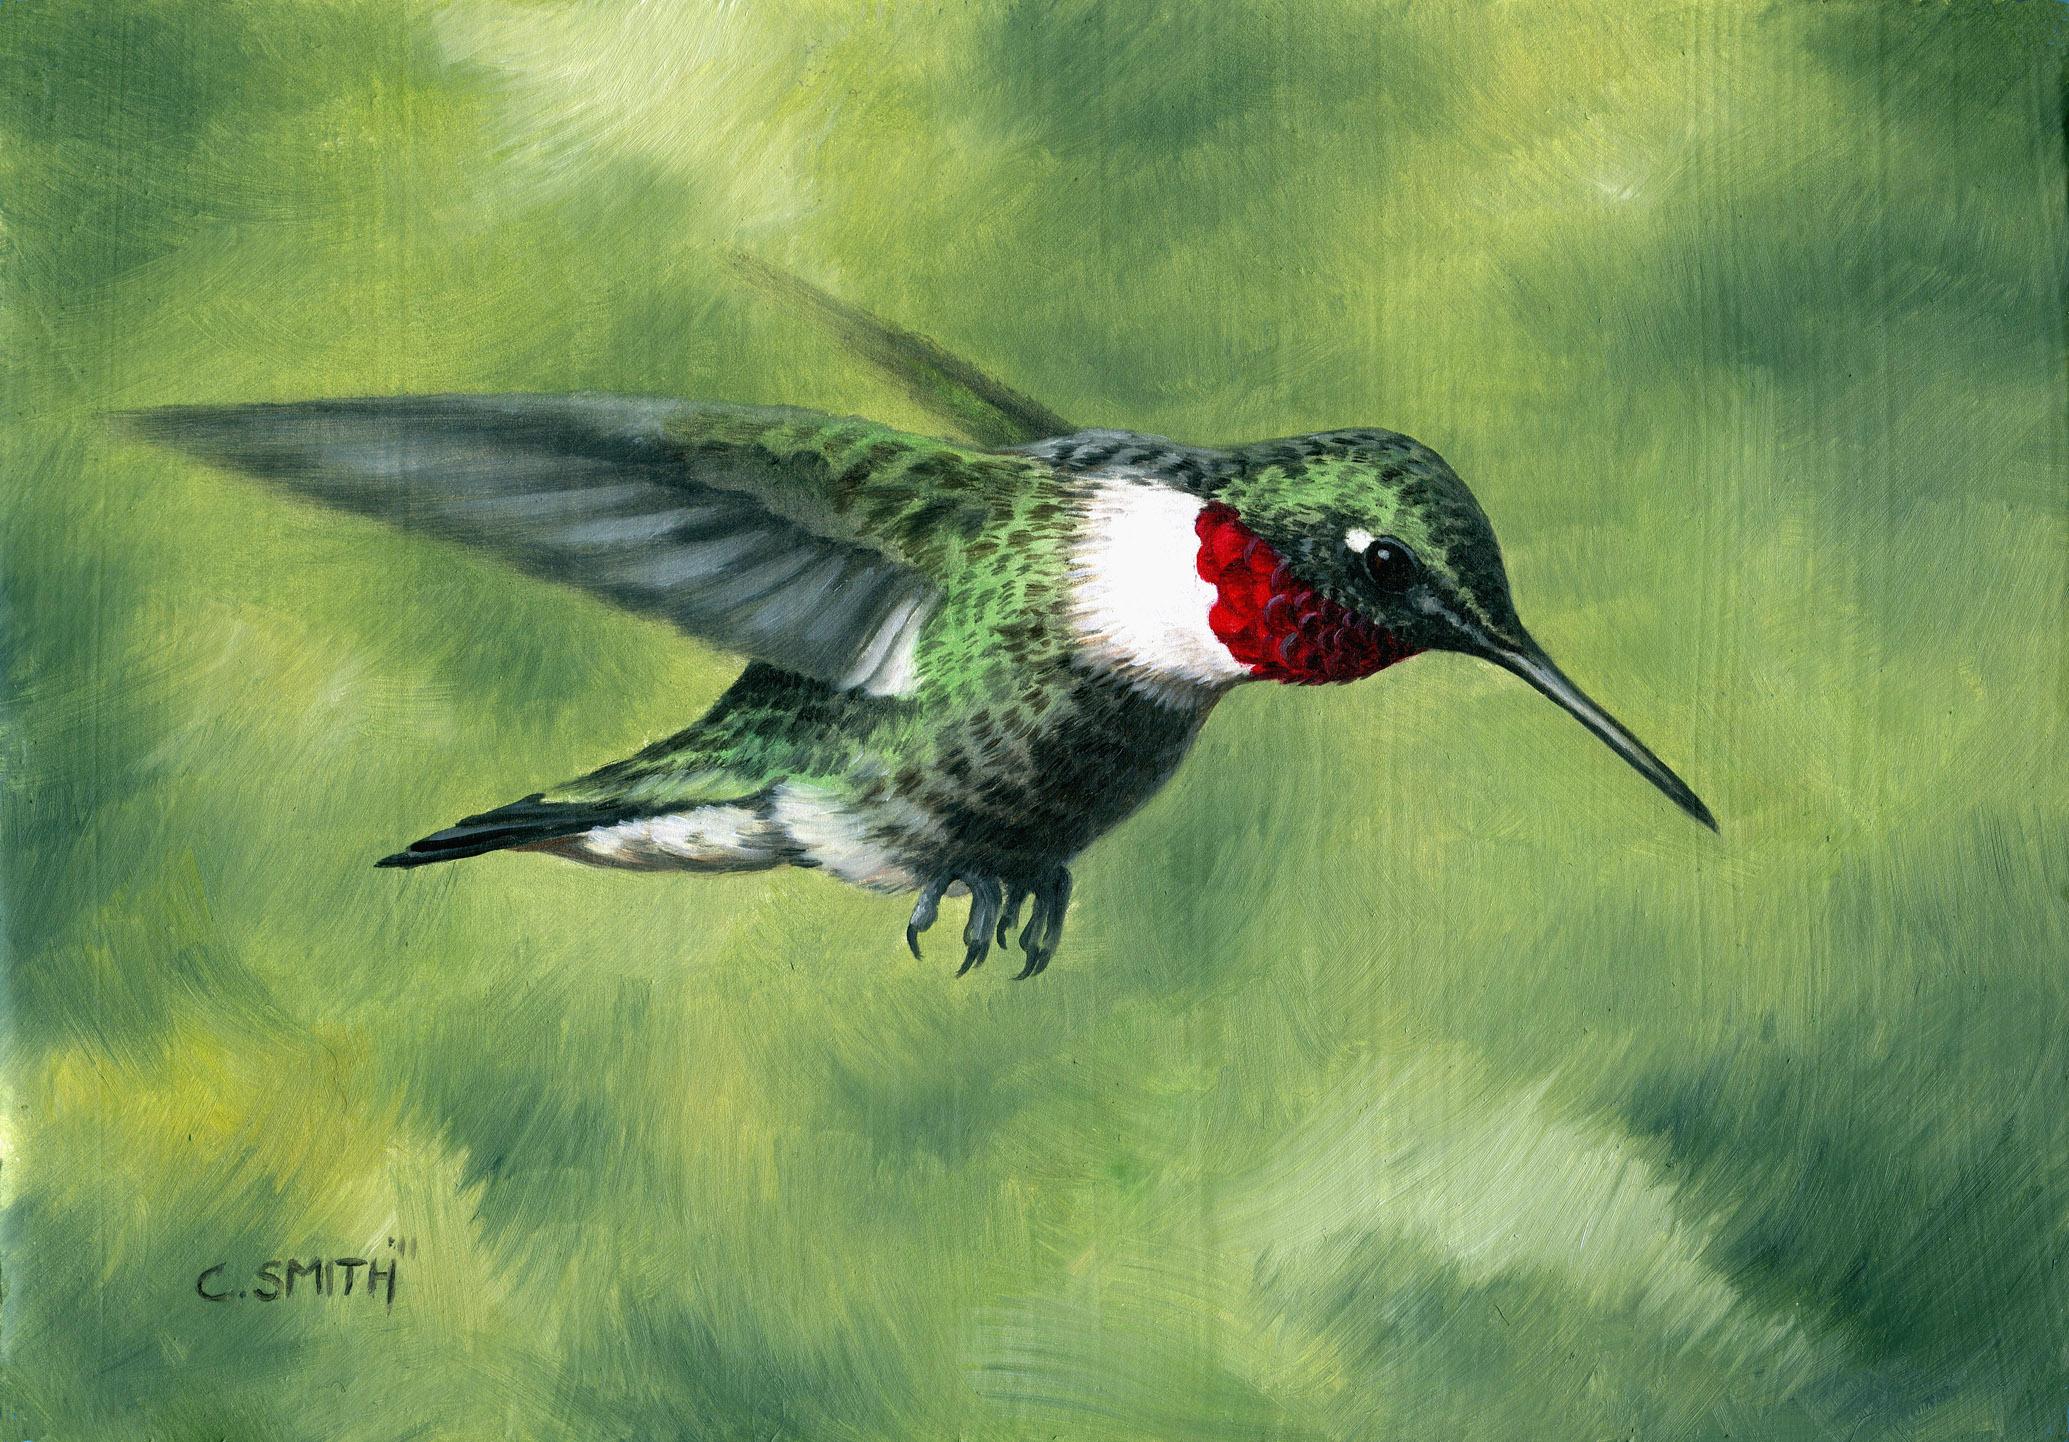 A Hummingbird Study